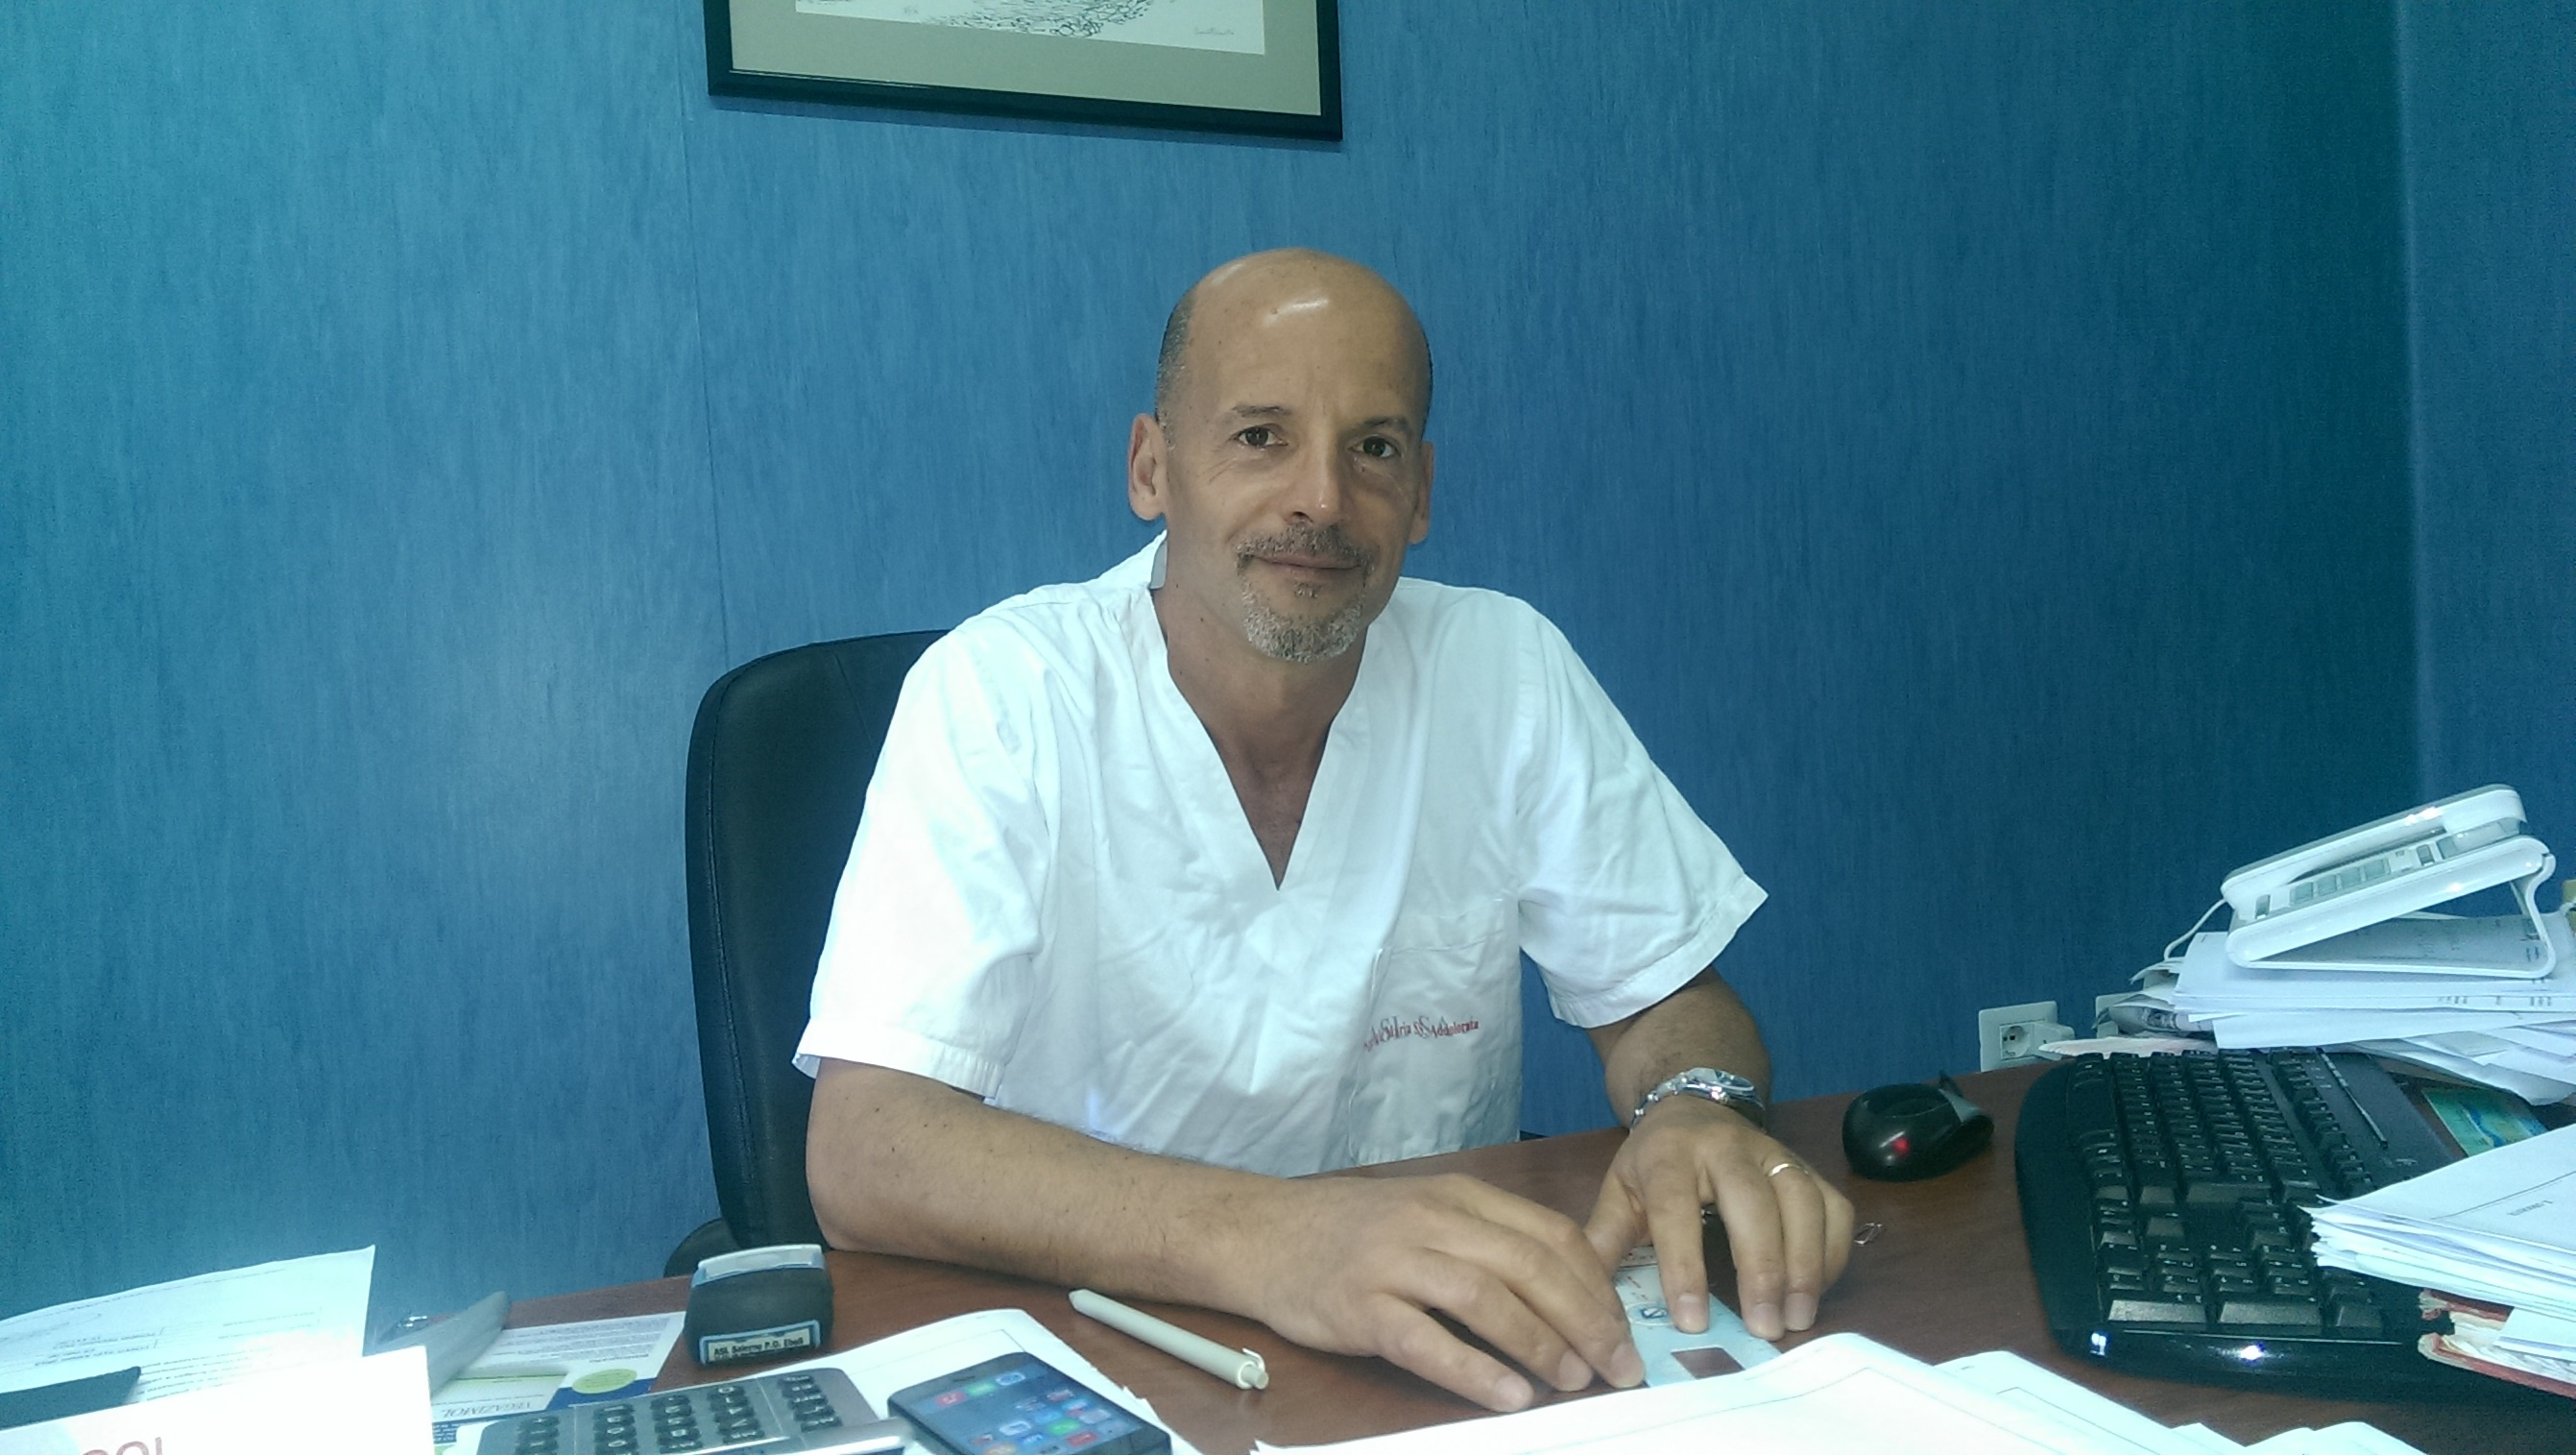 Giuseppe Gigliotti